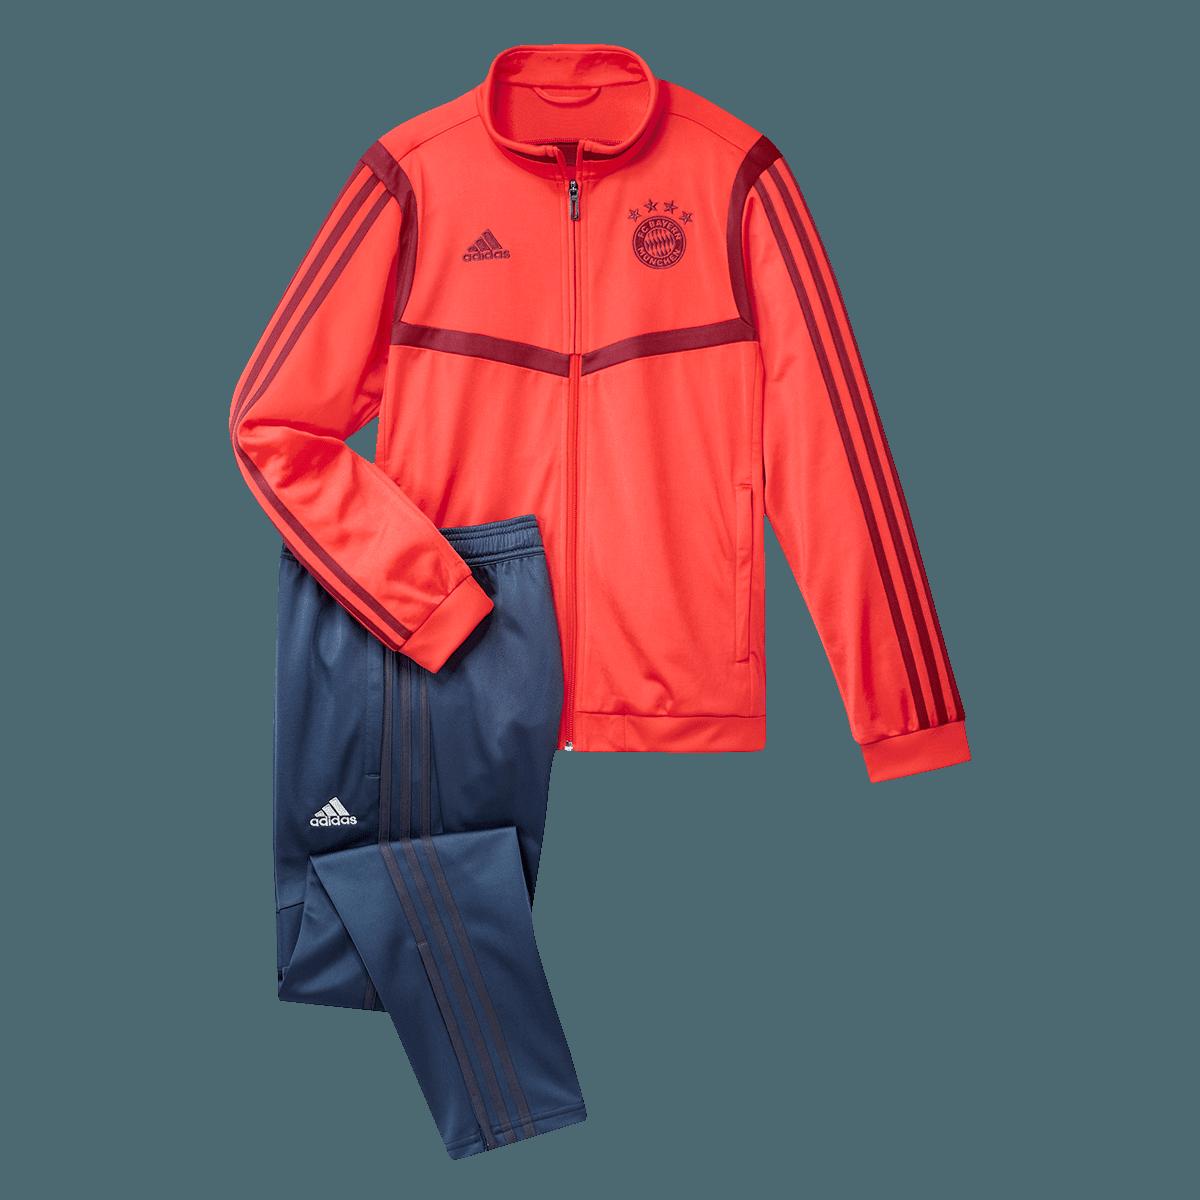 adidas FC Bayern München Kinder Trainingsanzug rotdunkelblau